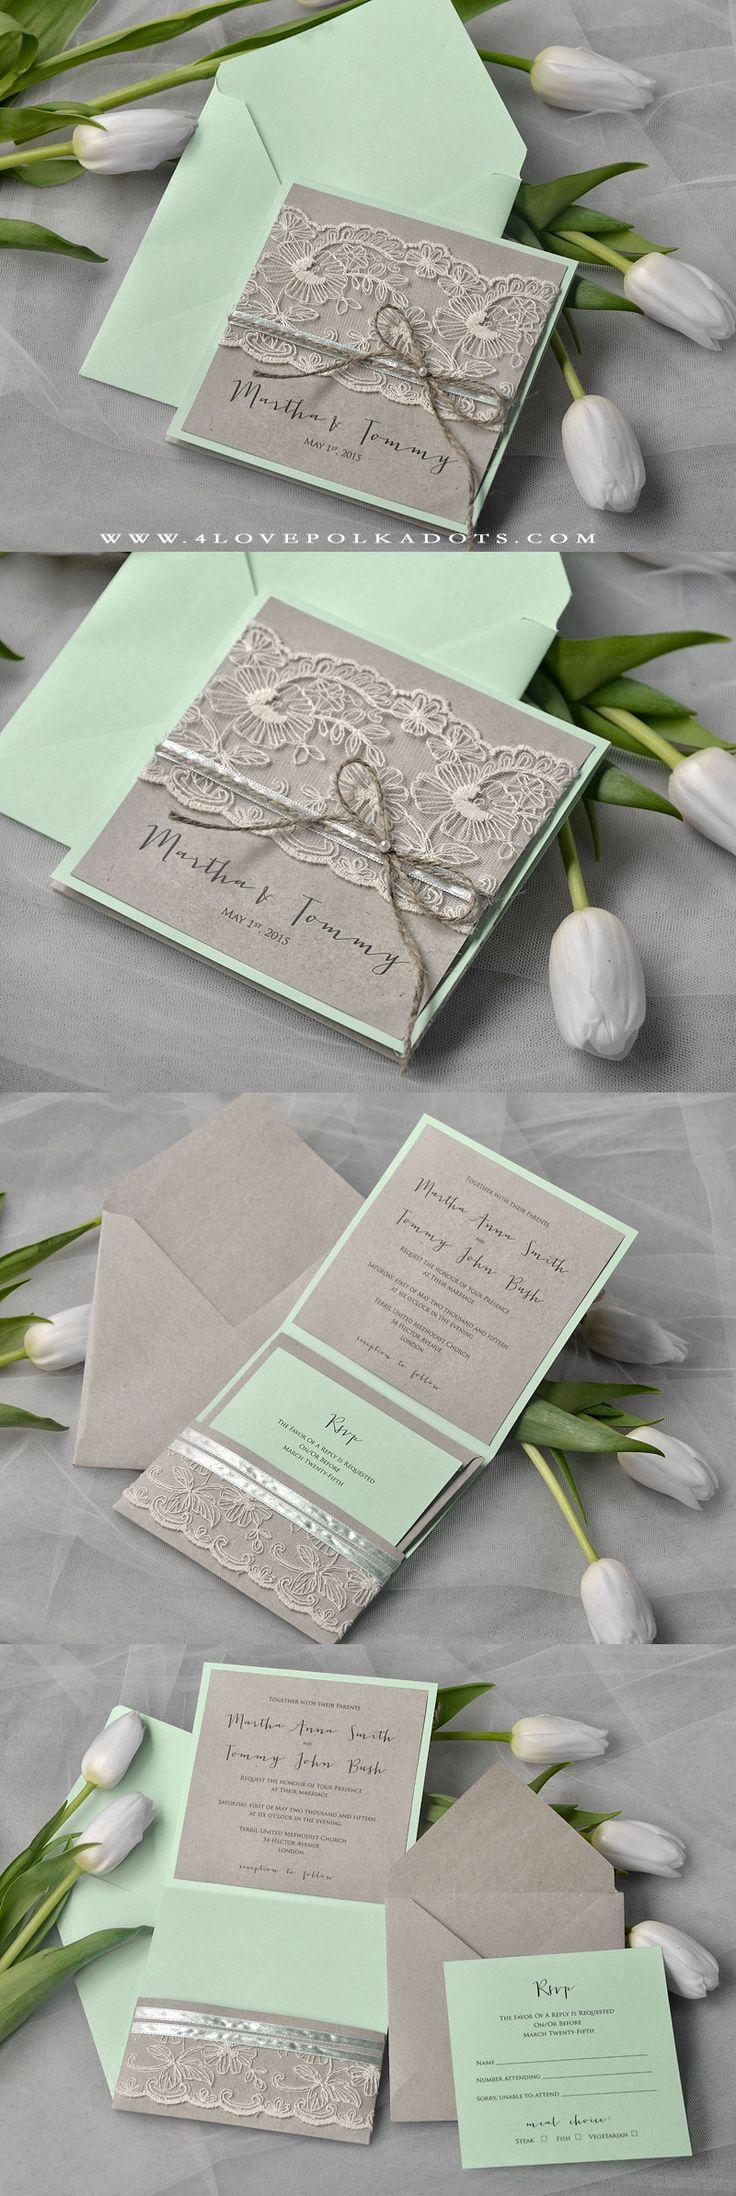 e wedding invitation for friends%0A Let our designers create dream wedding invitations especially for you